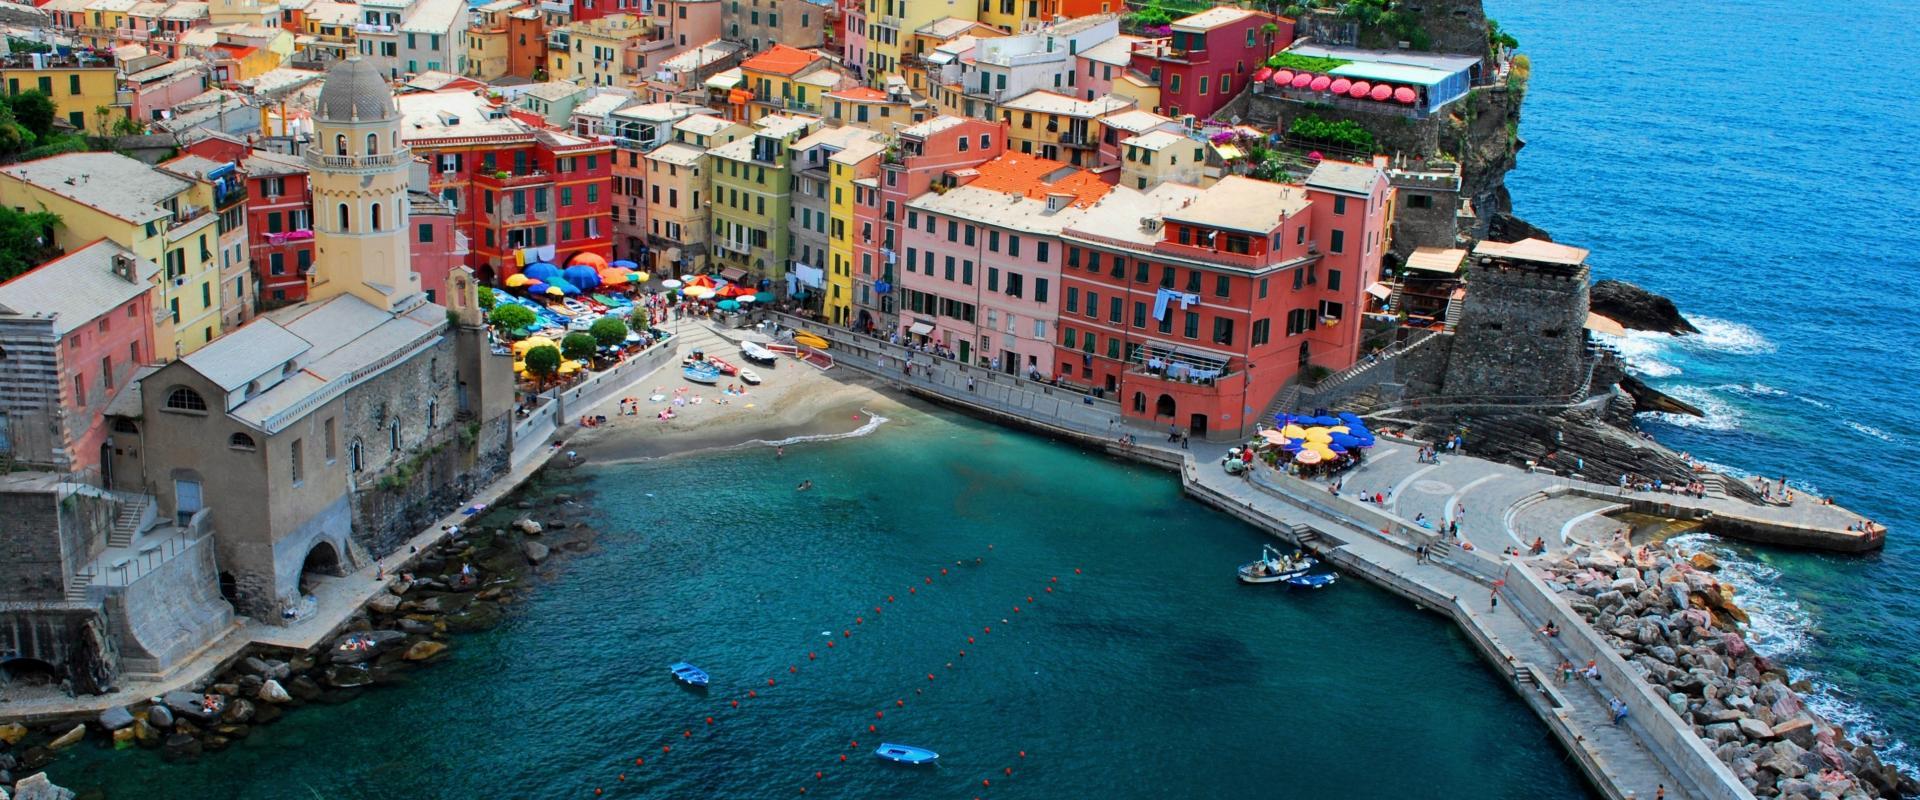 Visit of Vernazza Liguria